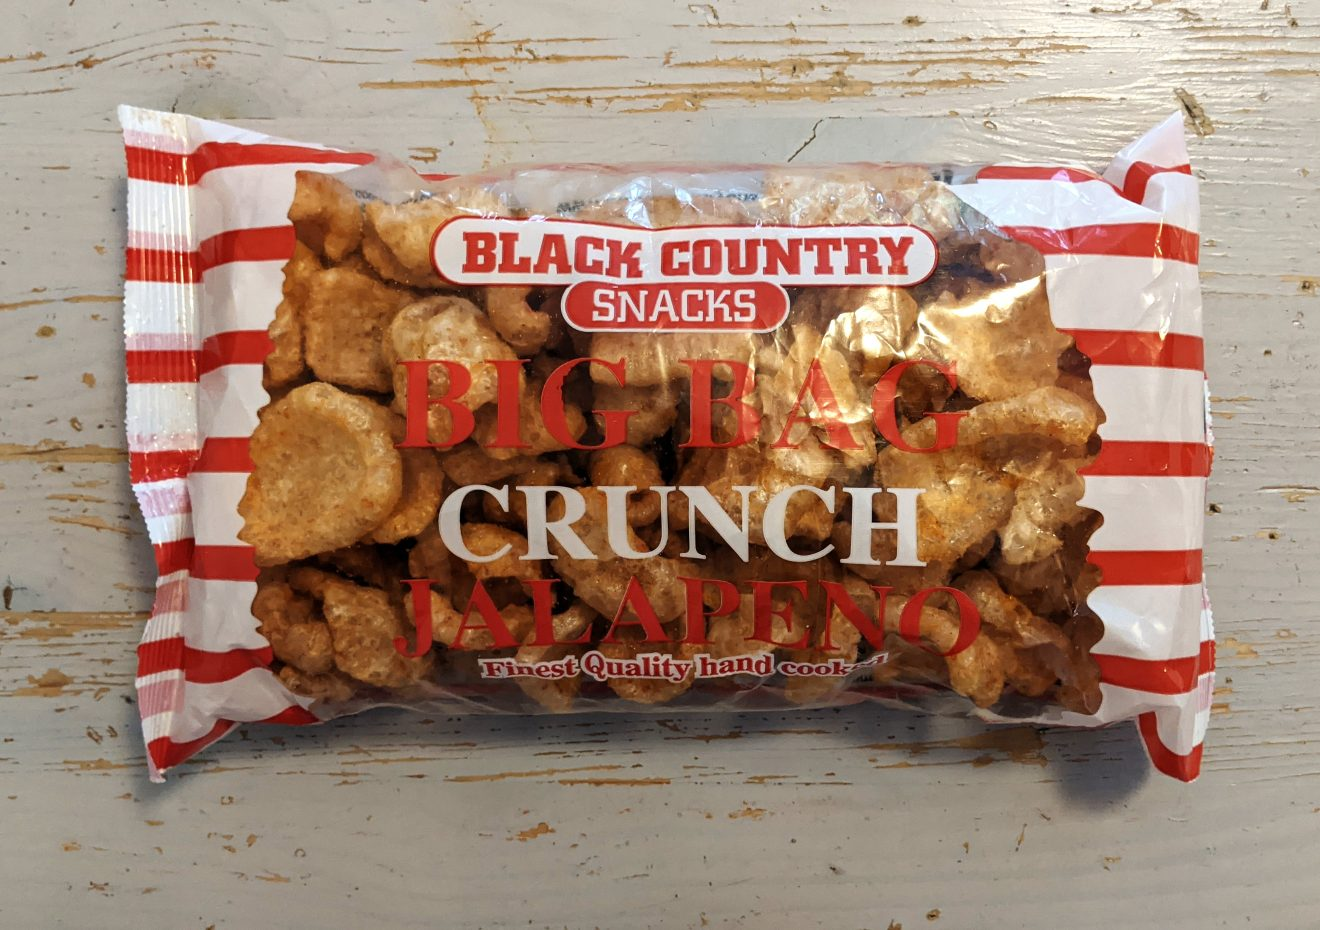 Black Country Snacks, Big Bag Crunch Jalapeno Review